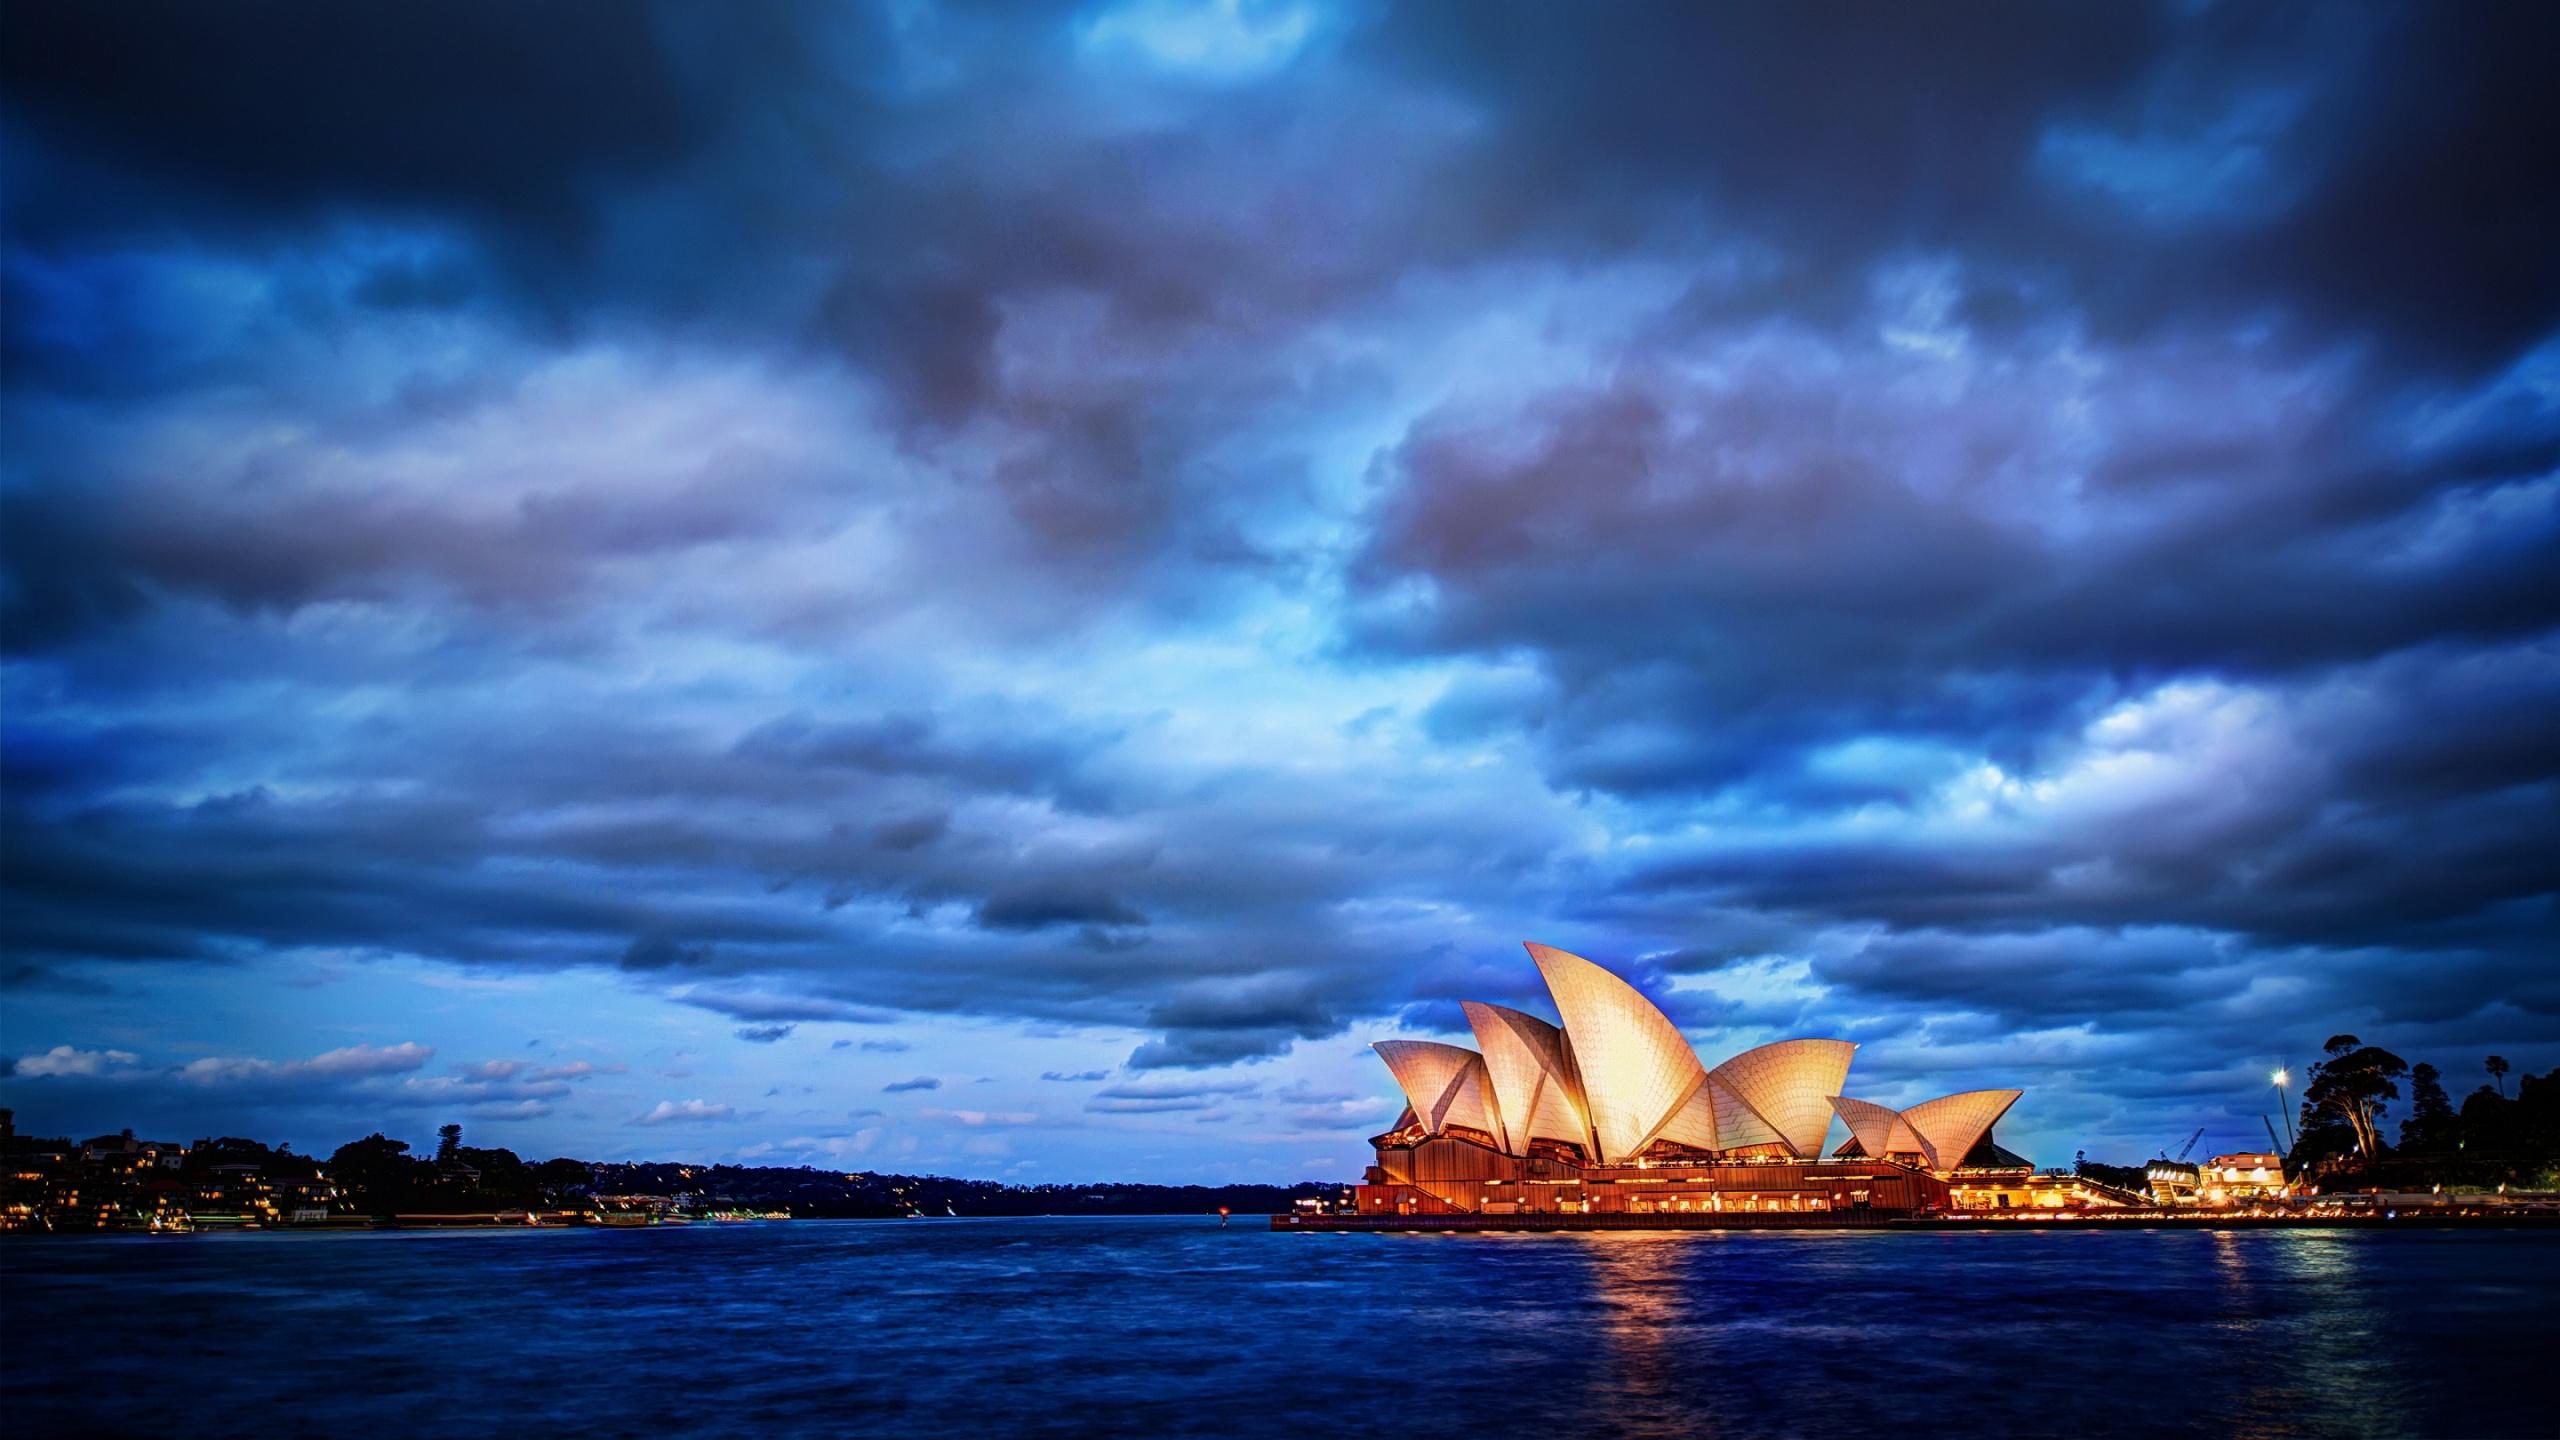 Sydney Opera House Landscape Wallpaper Travel HD Wallpapers 2560x1440